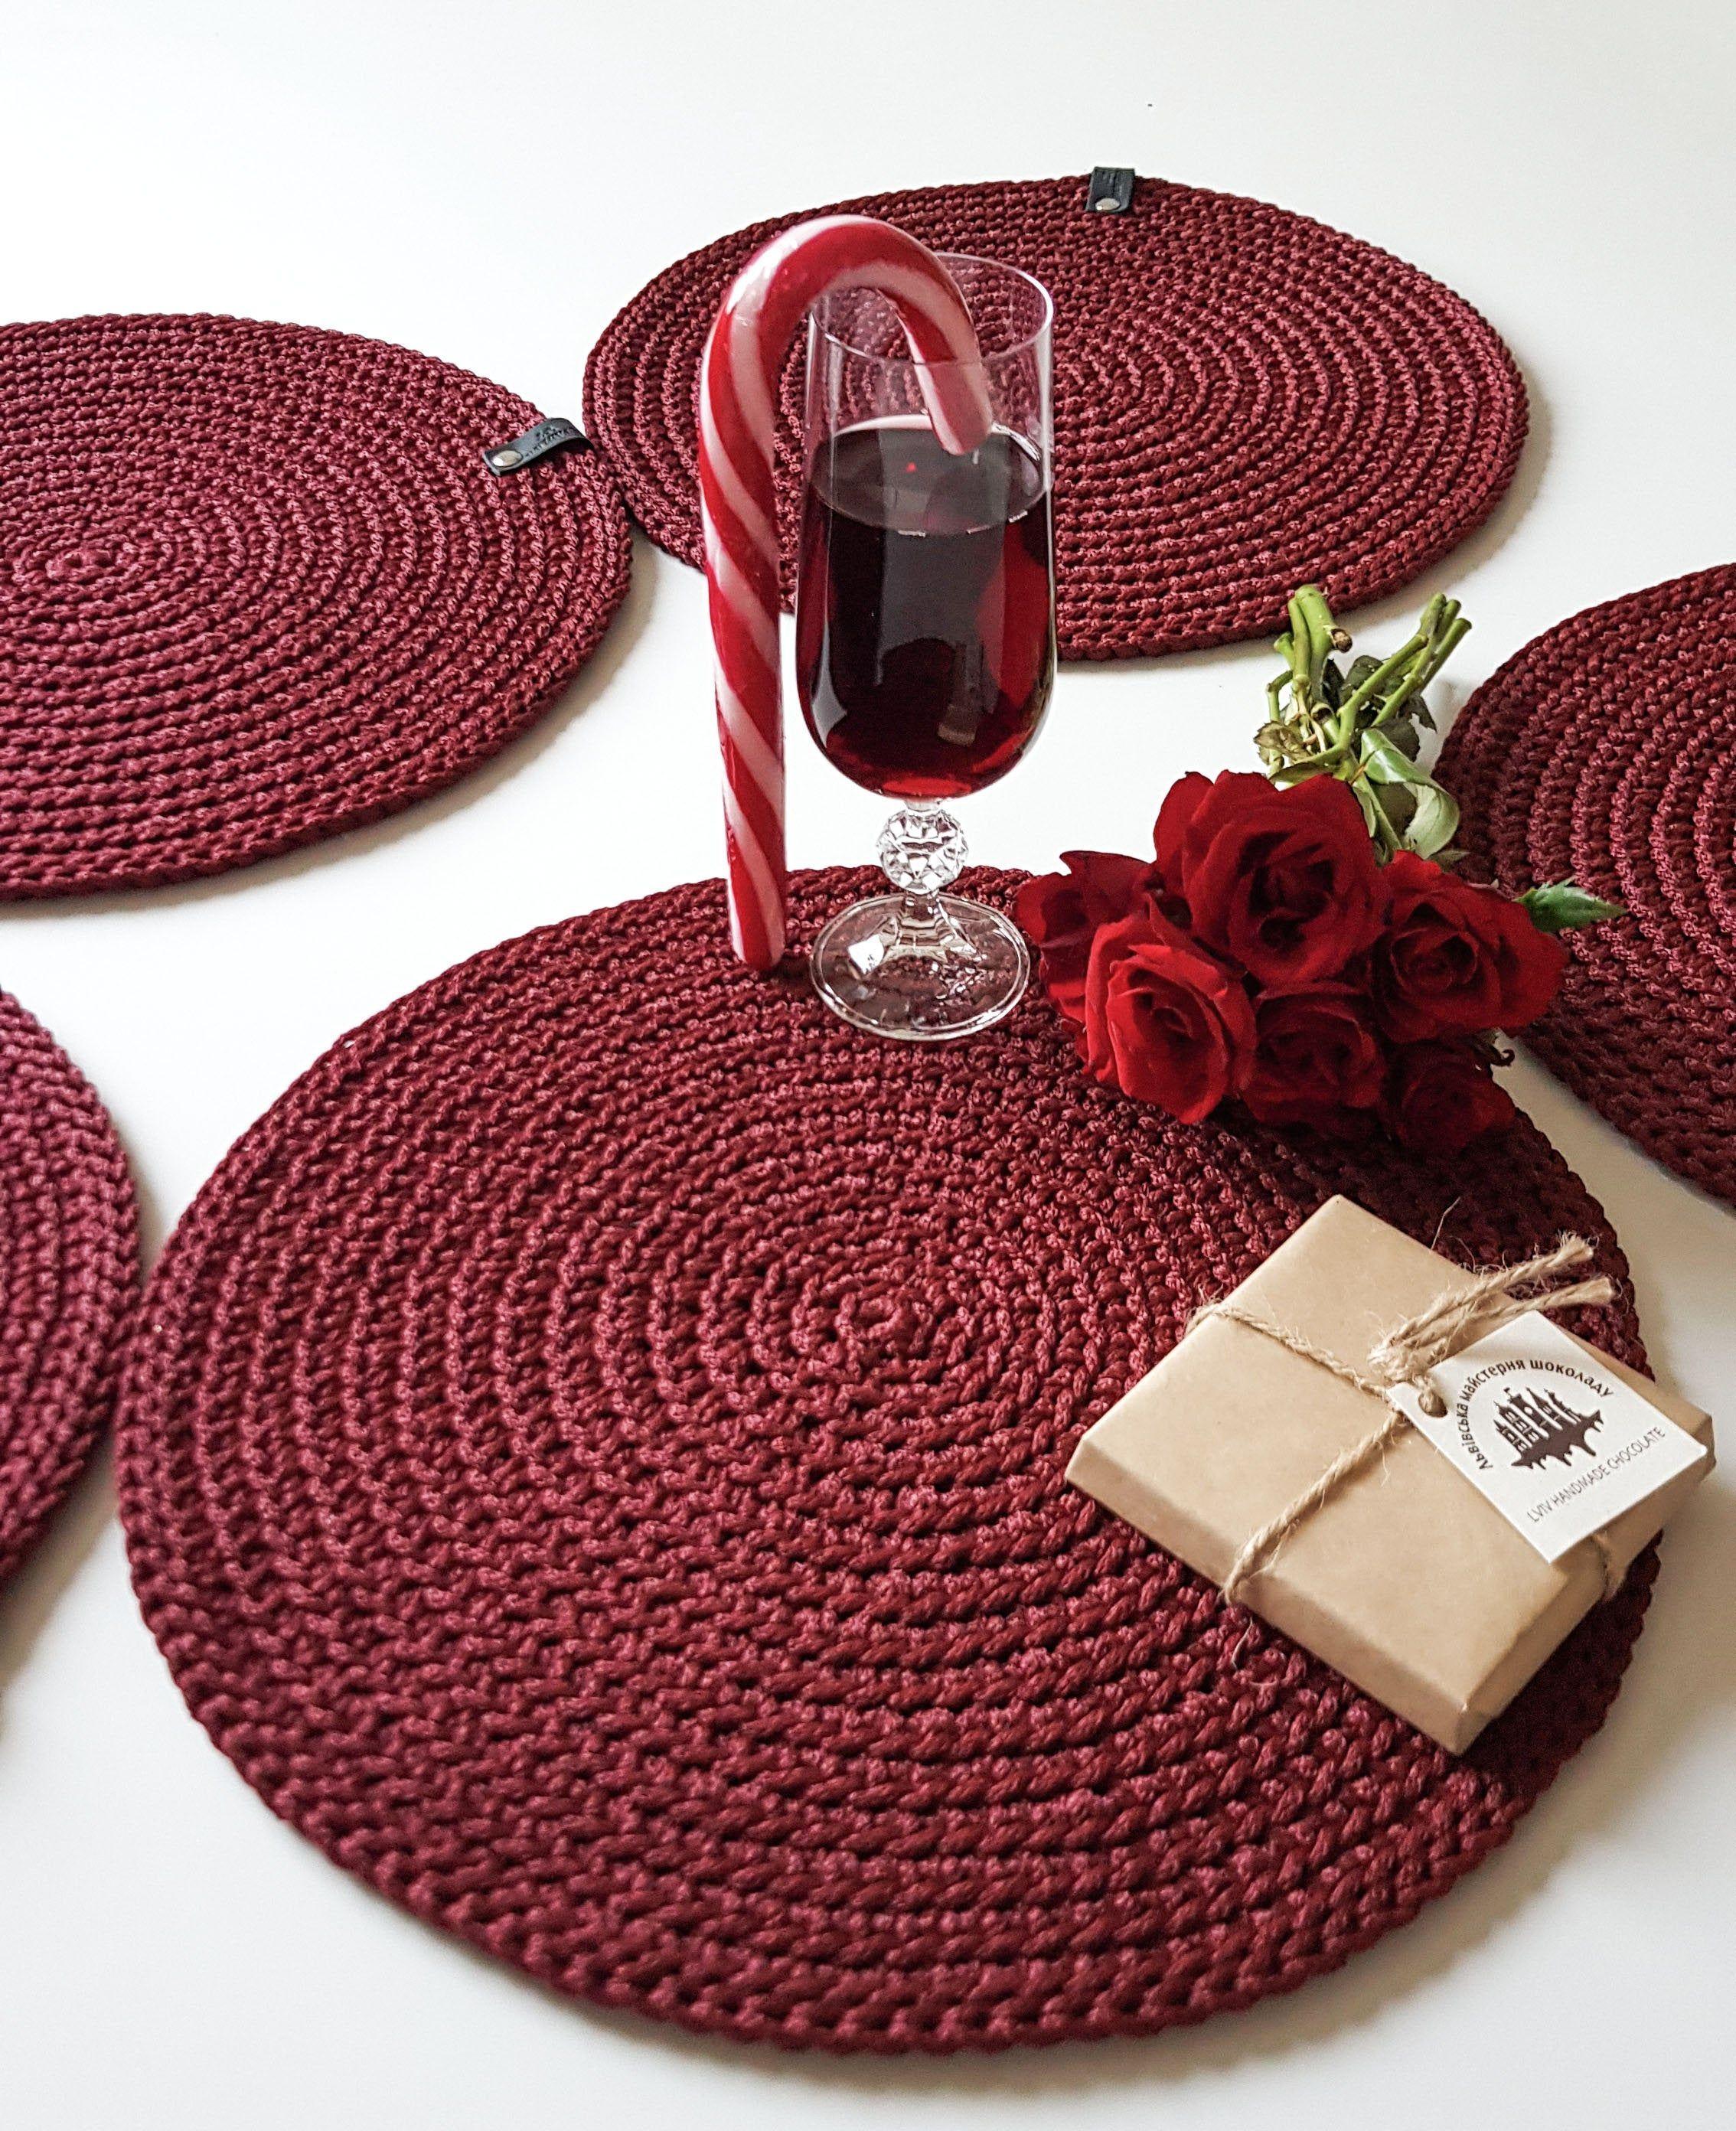 Jute placemats Crochet decor Handmade crochet jute placemat and coaster Dinner placemats Table decor Placemats Rustic home decor